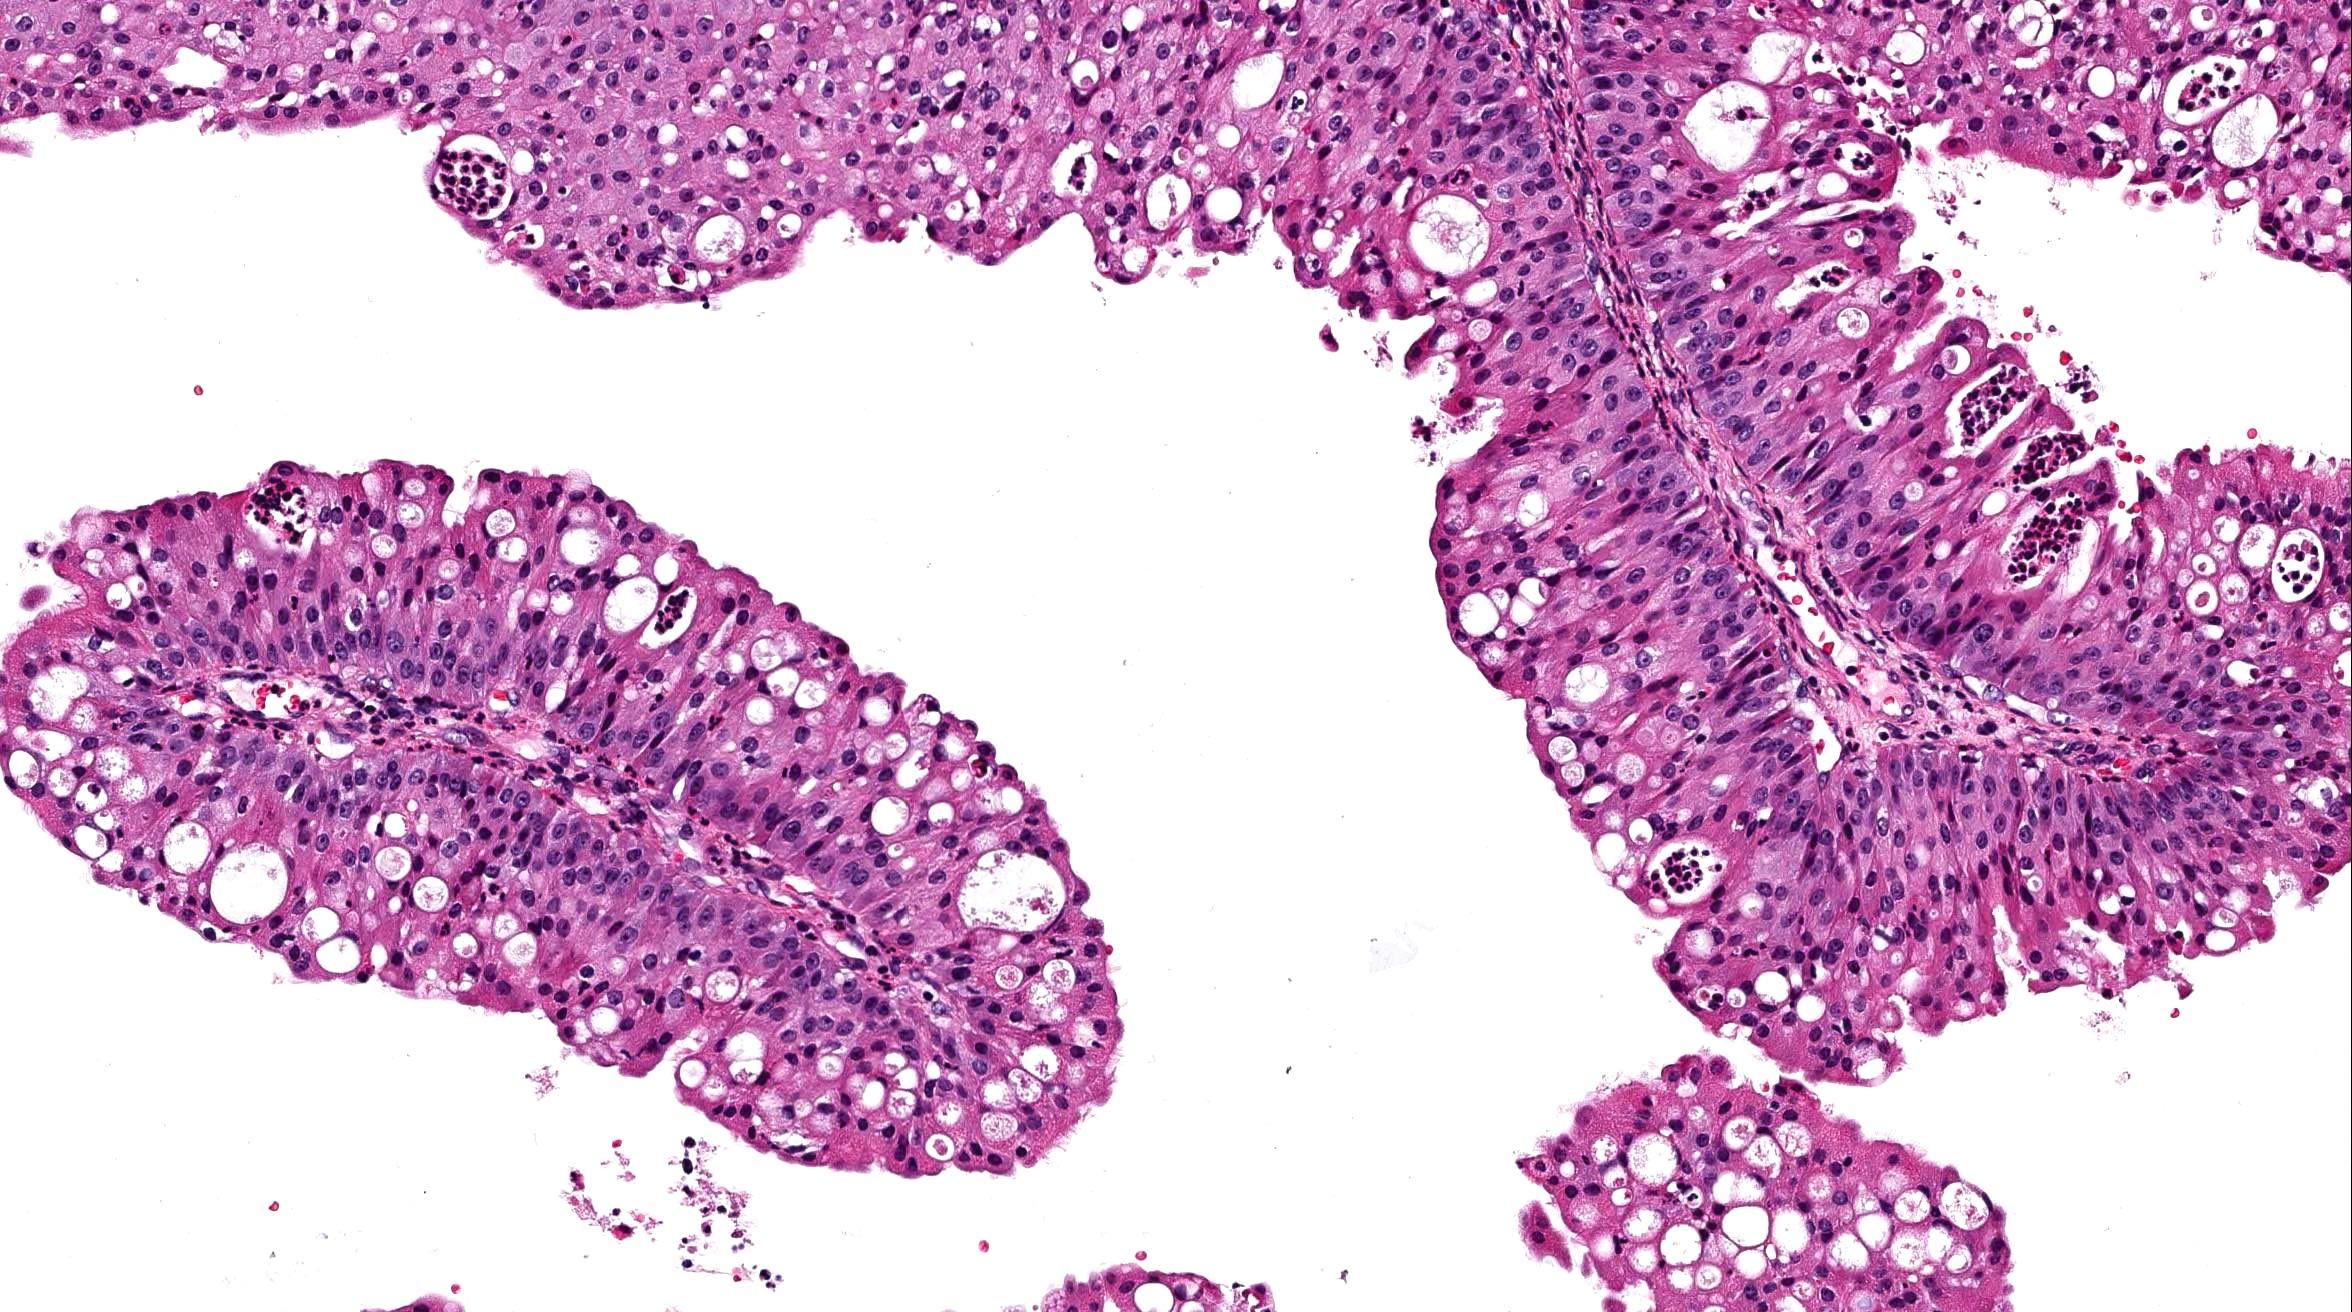 sinonasal inverted papilloma icd 10)